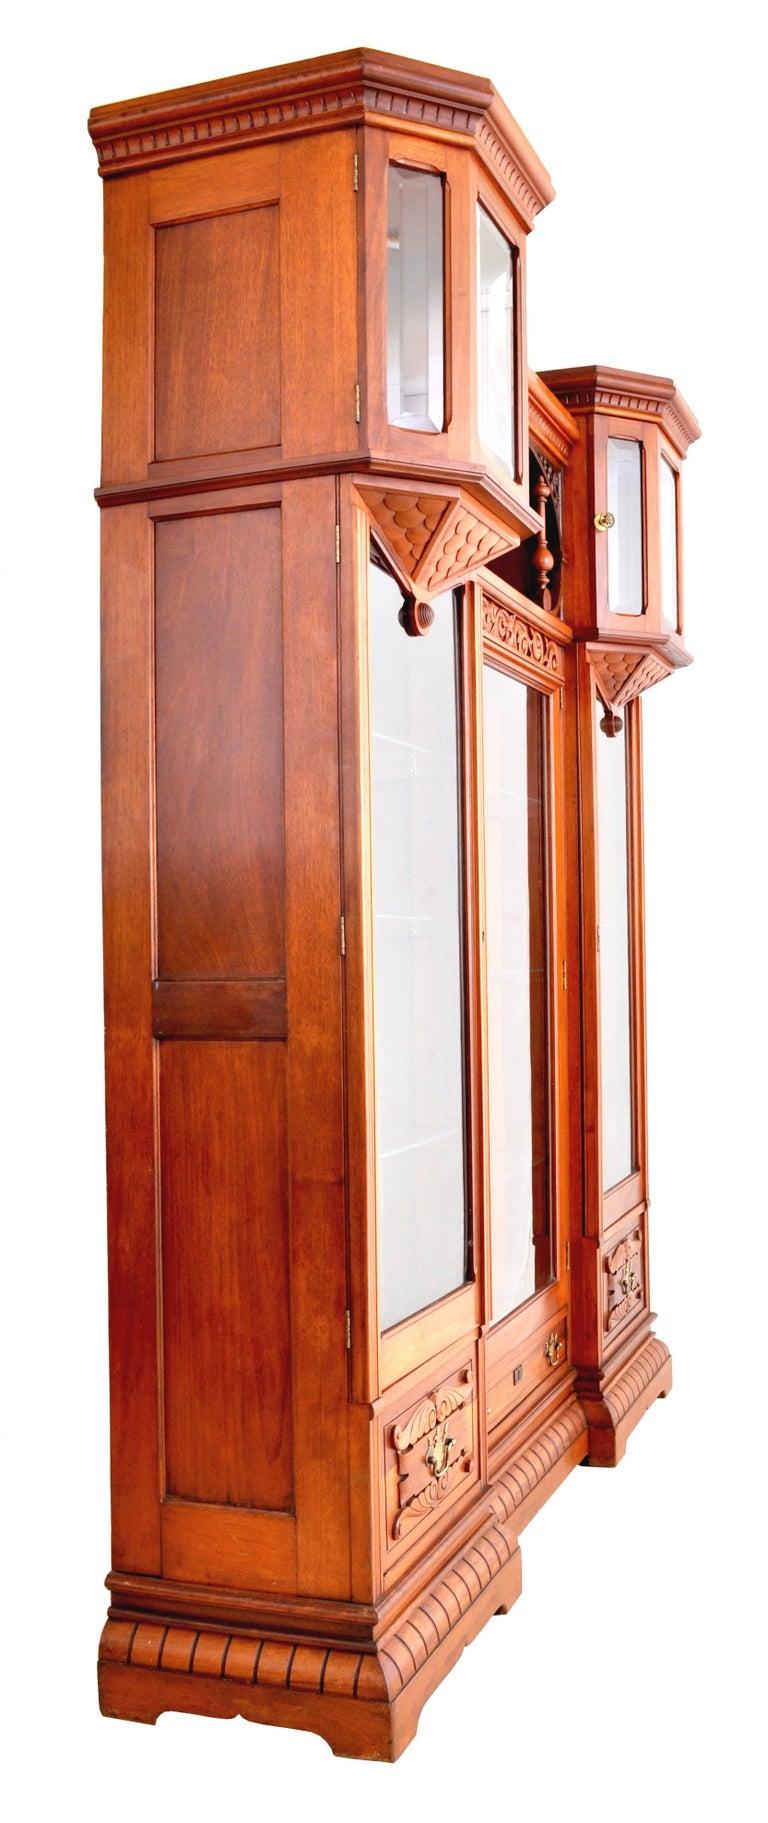 Antique American Eastlake Walnut Breakfront Bookcase/Hutch/Cabinet, circa 1890 For Sale 2